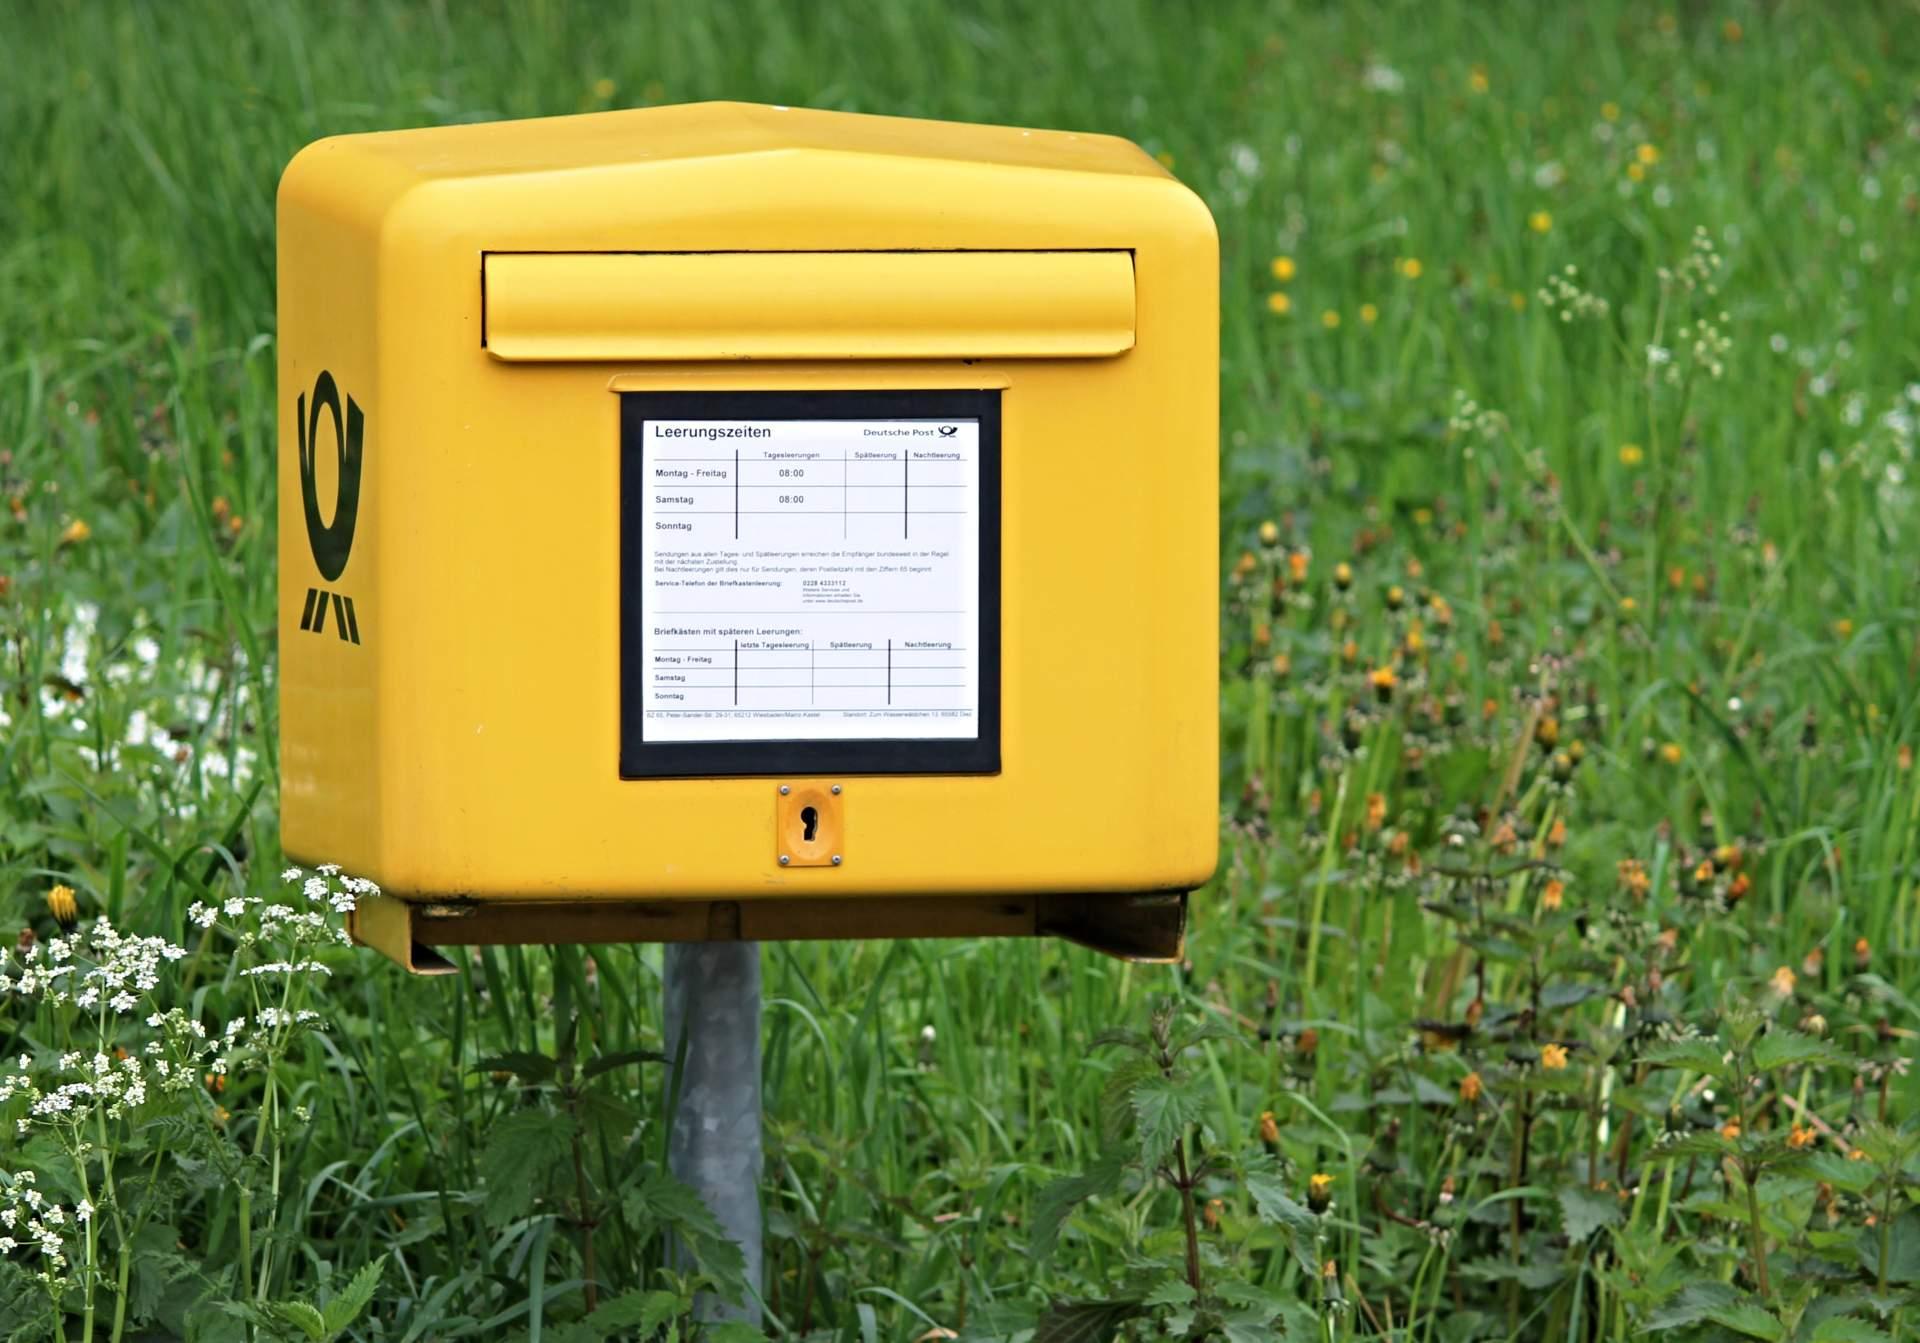 Deutsche Post Betrug